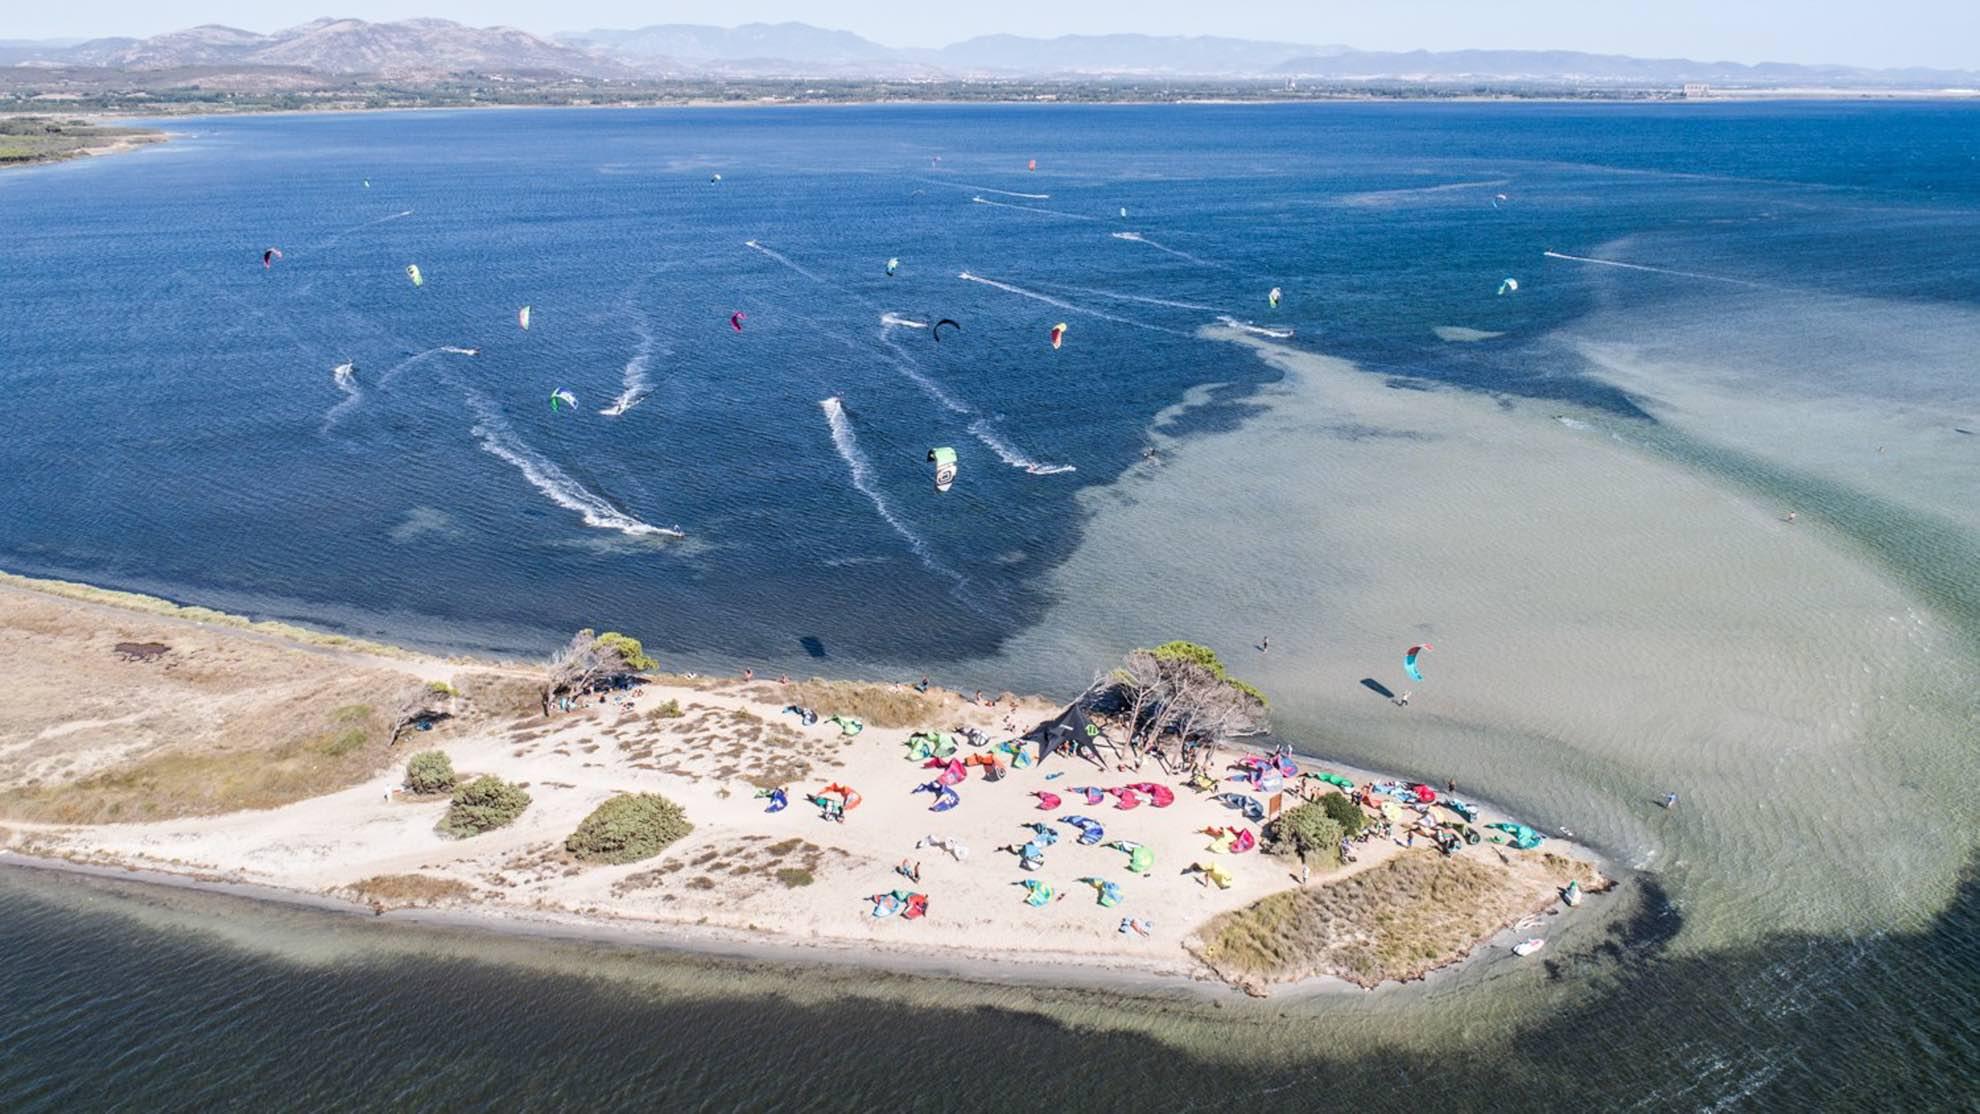 Punta Trettu Kite Beach The Best Kite Spot of Sardinia